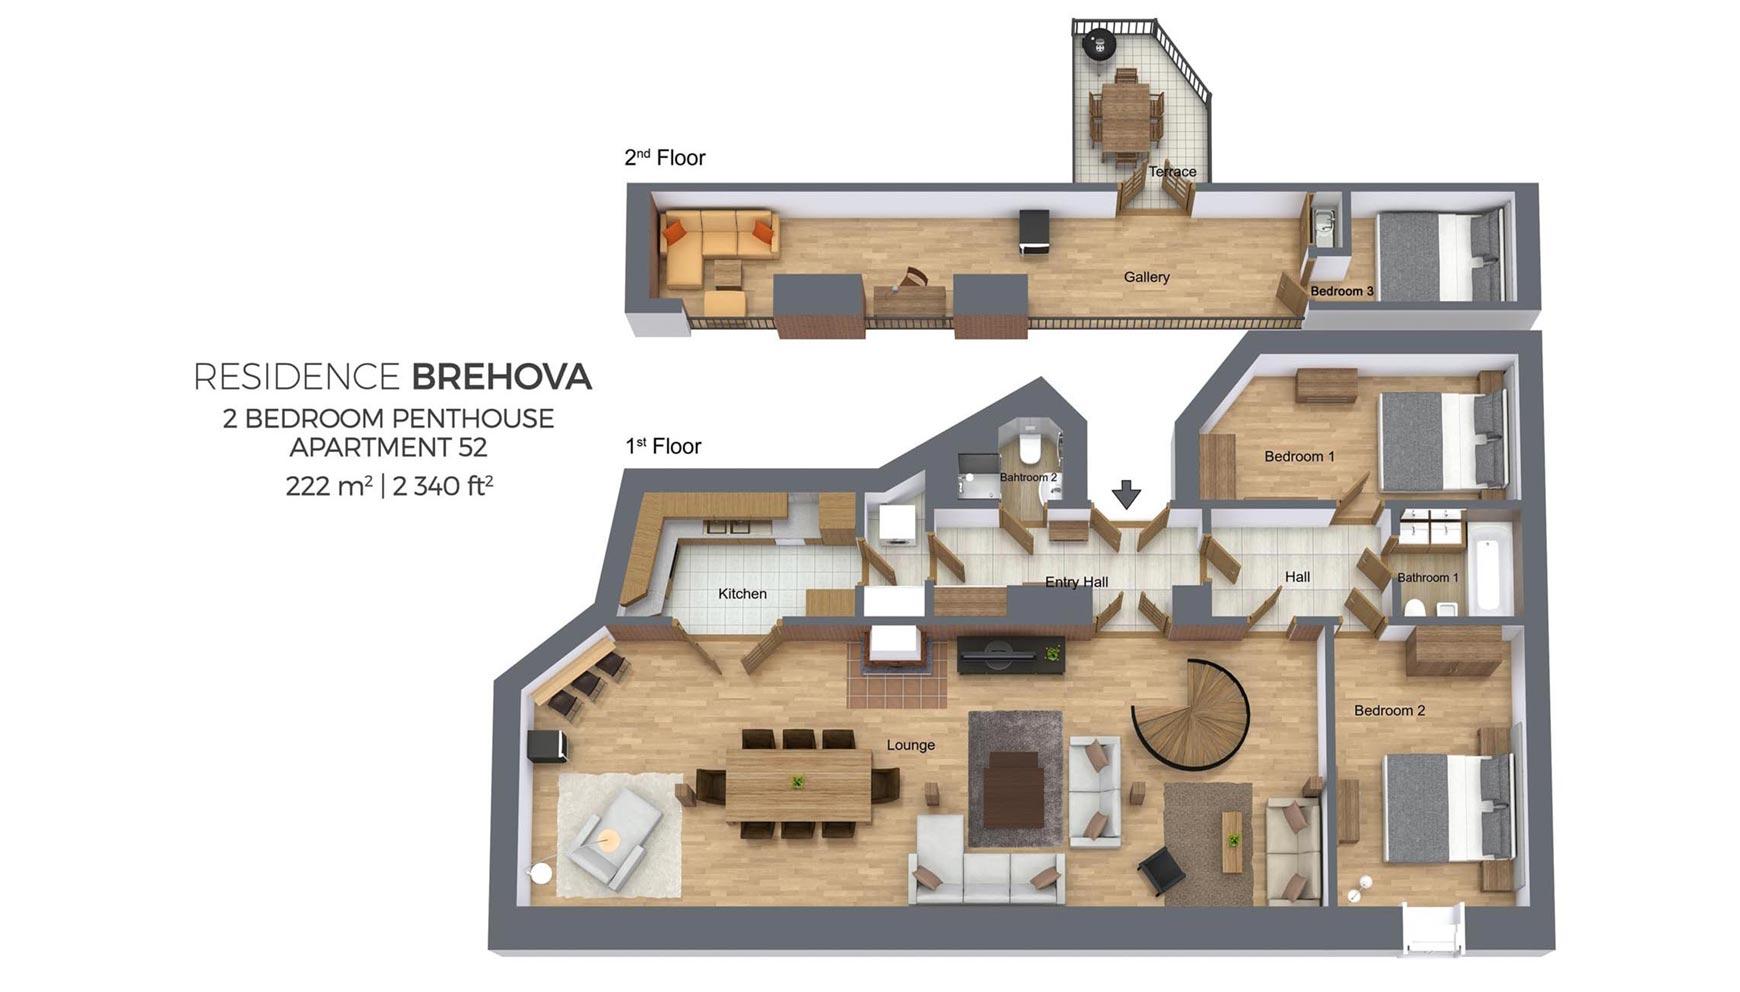 Penthouse Apartment Floor Plans Penthouse Apartment No 52 Residence Brehova